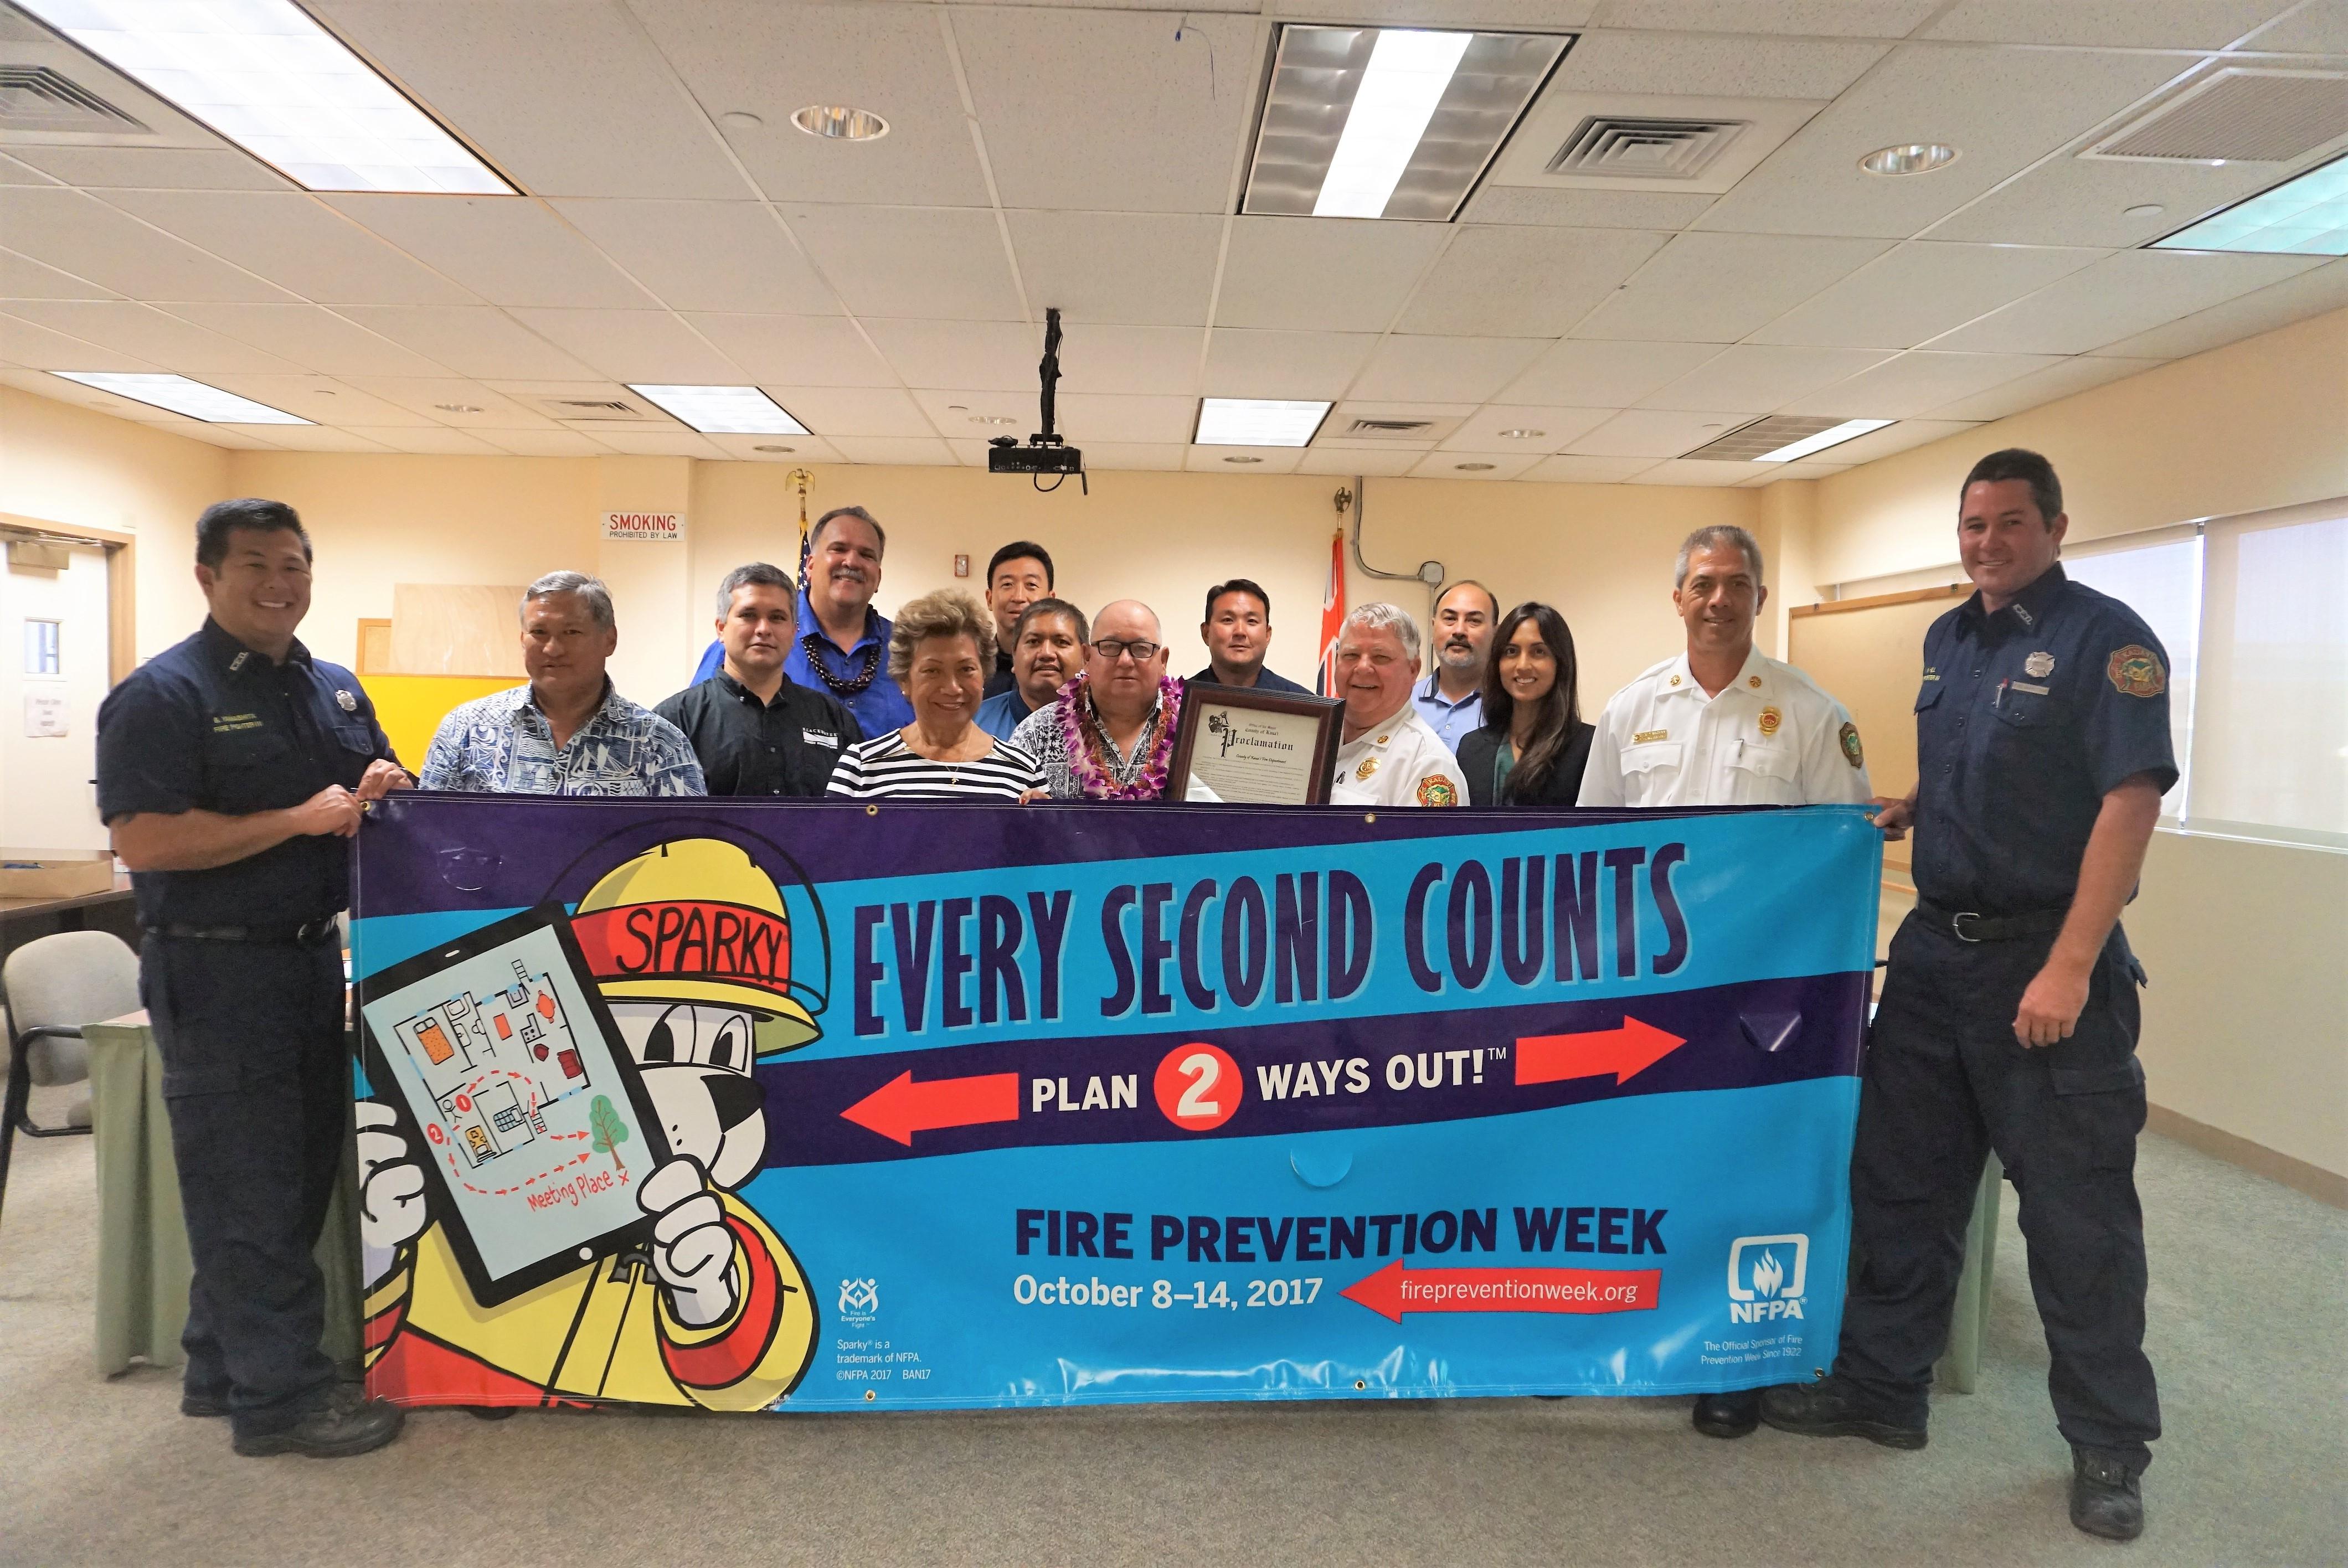 Fire Prevention Week 2017